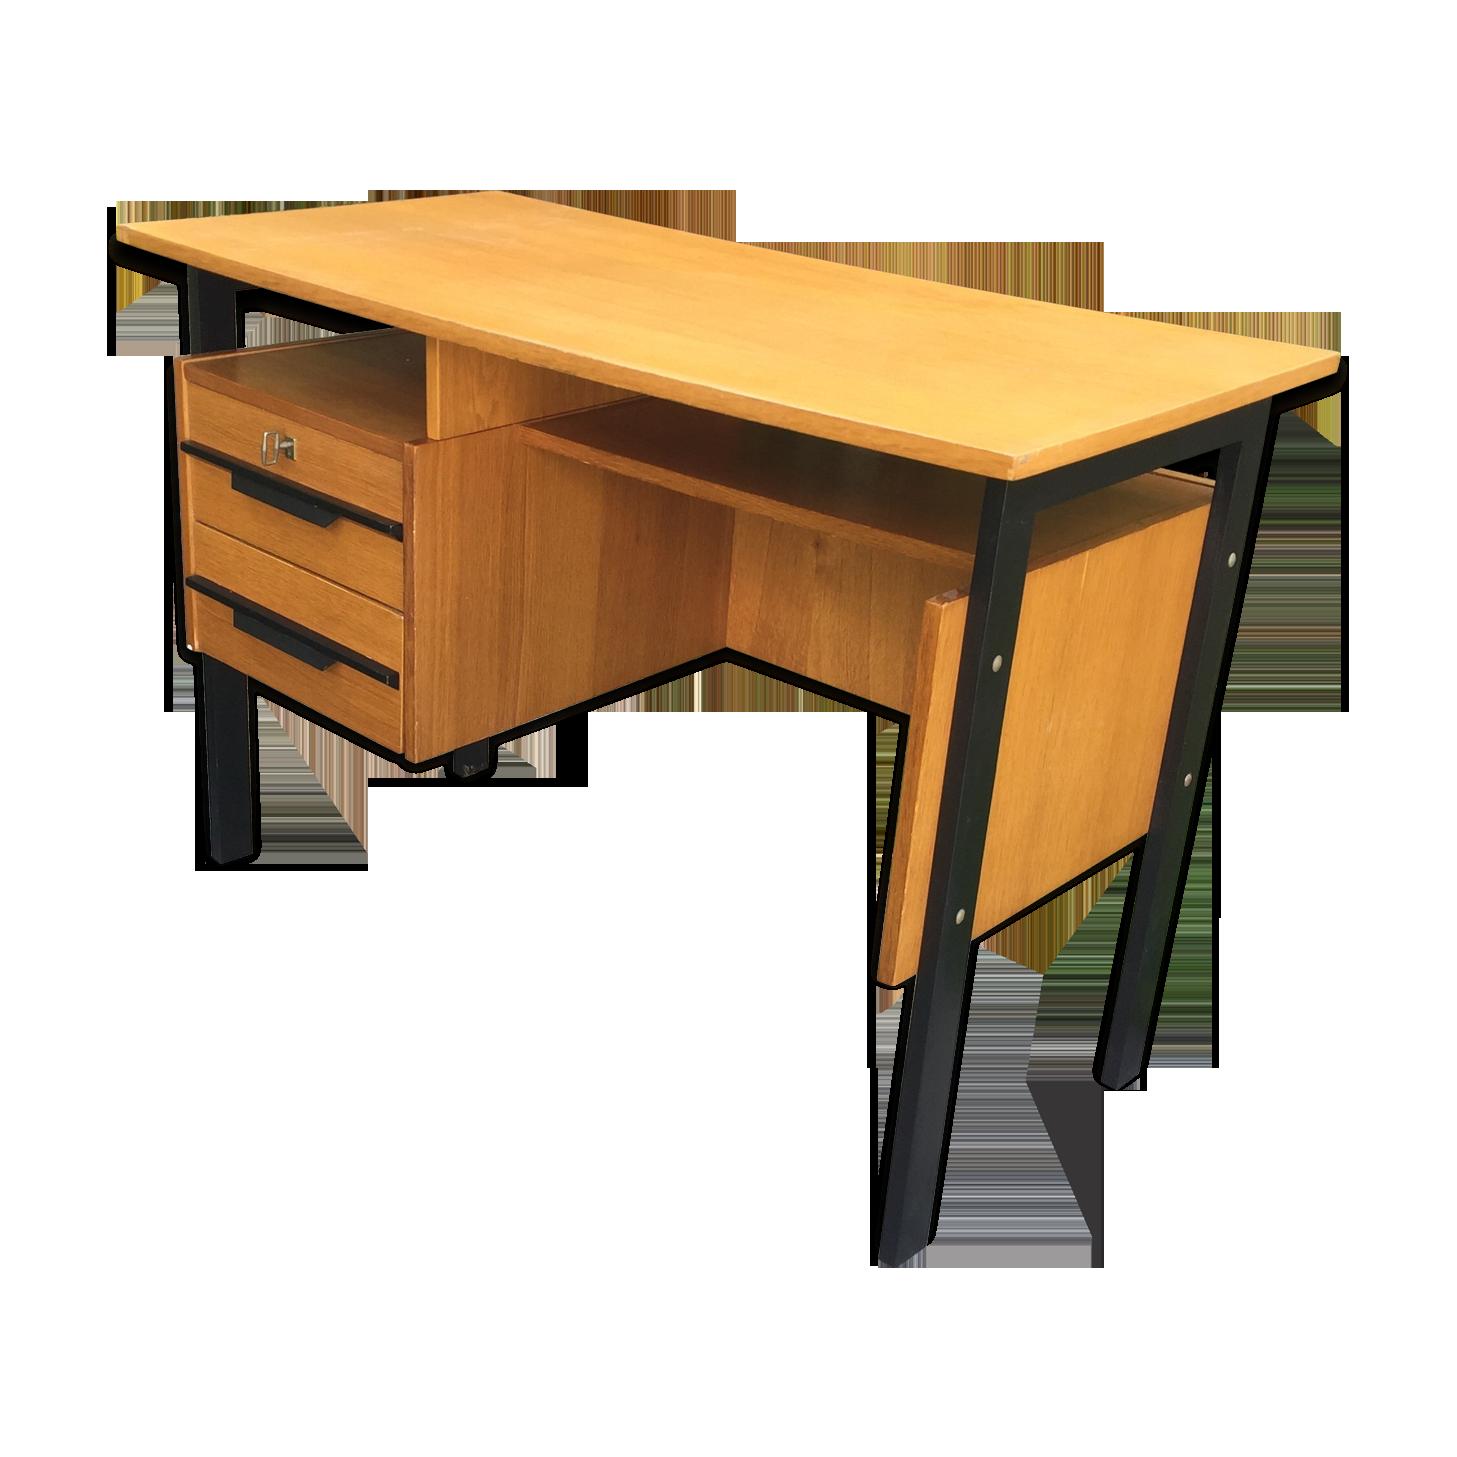 Bureau moderniste pieds noirs bois blond bois matériau